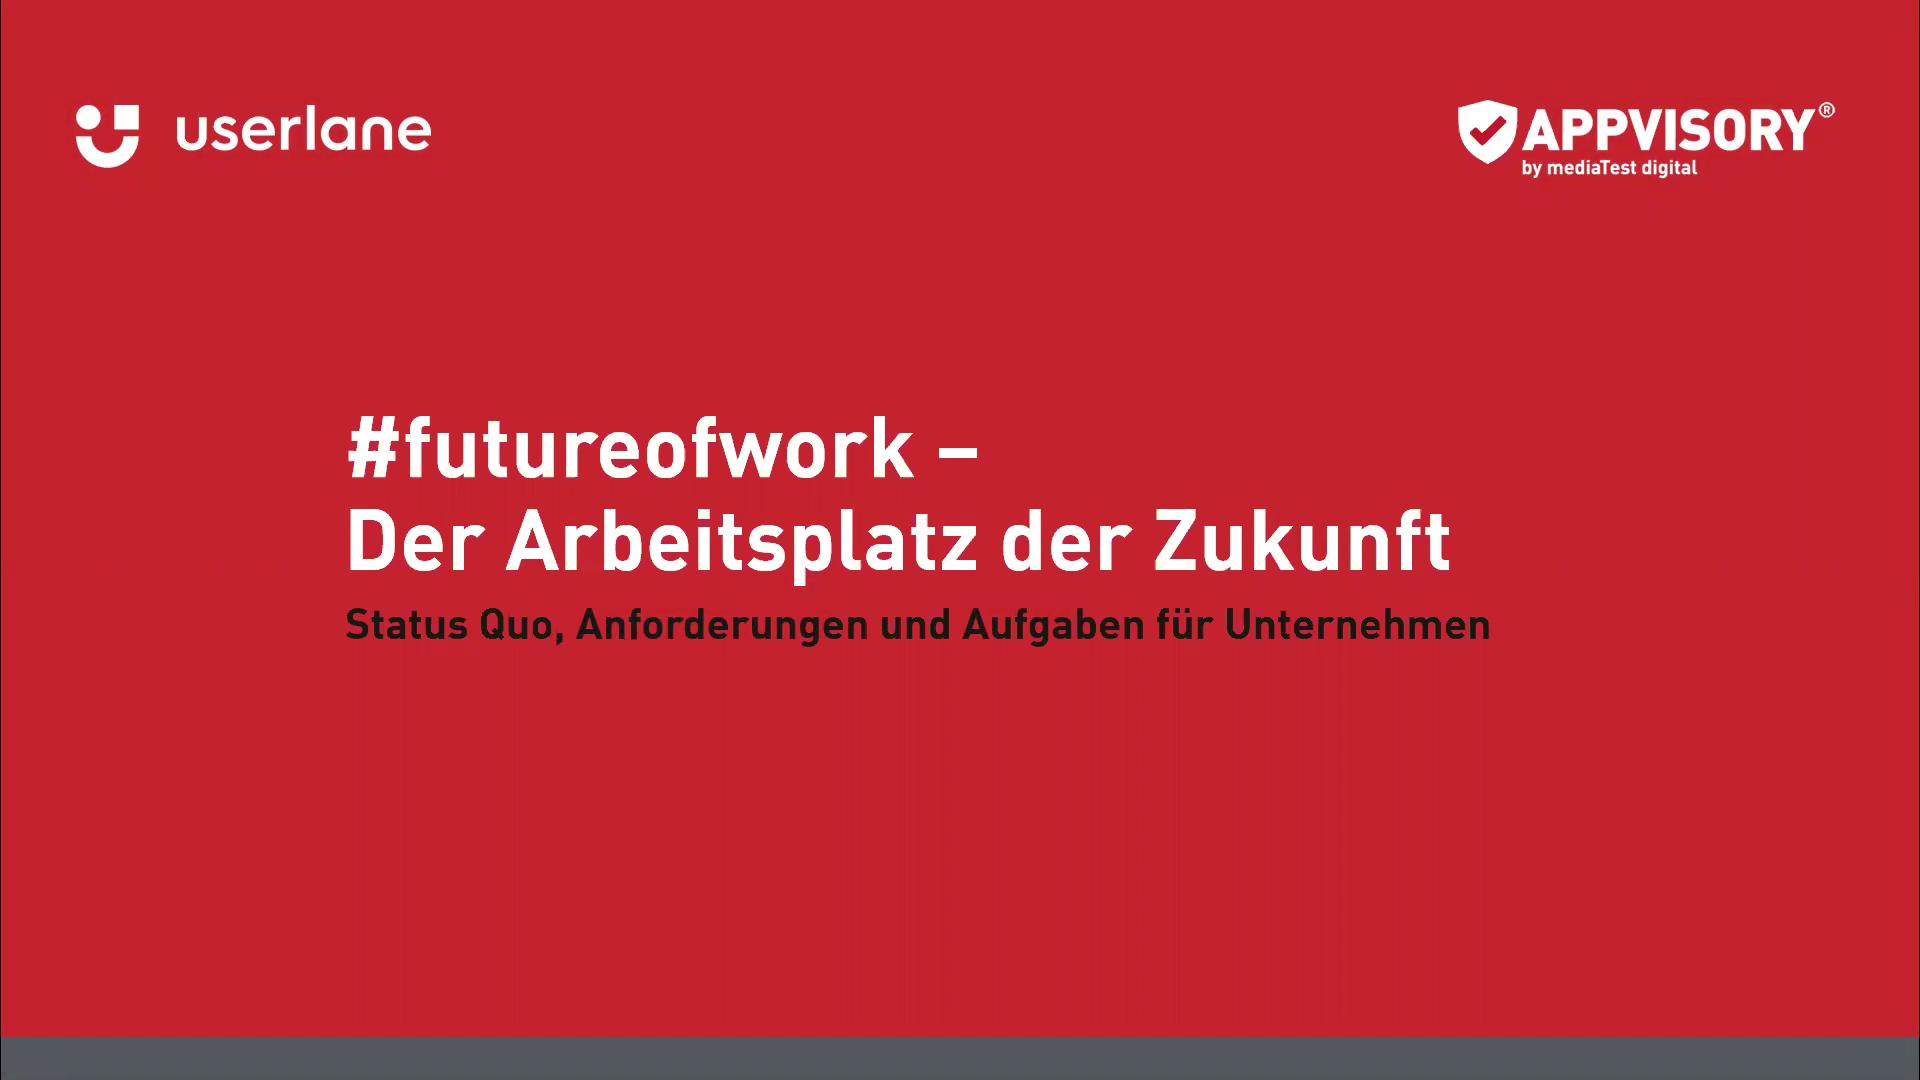 APPVISORY Userlane futureofwork Webinar